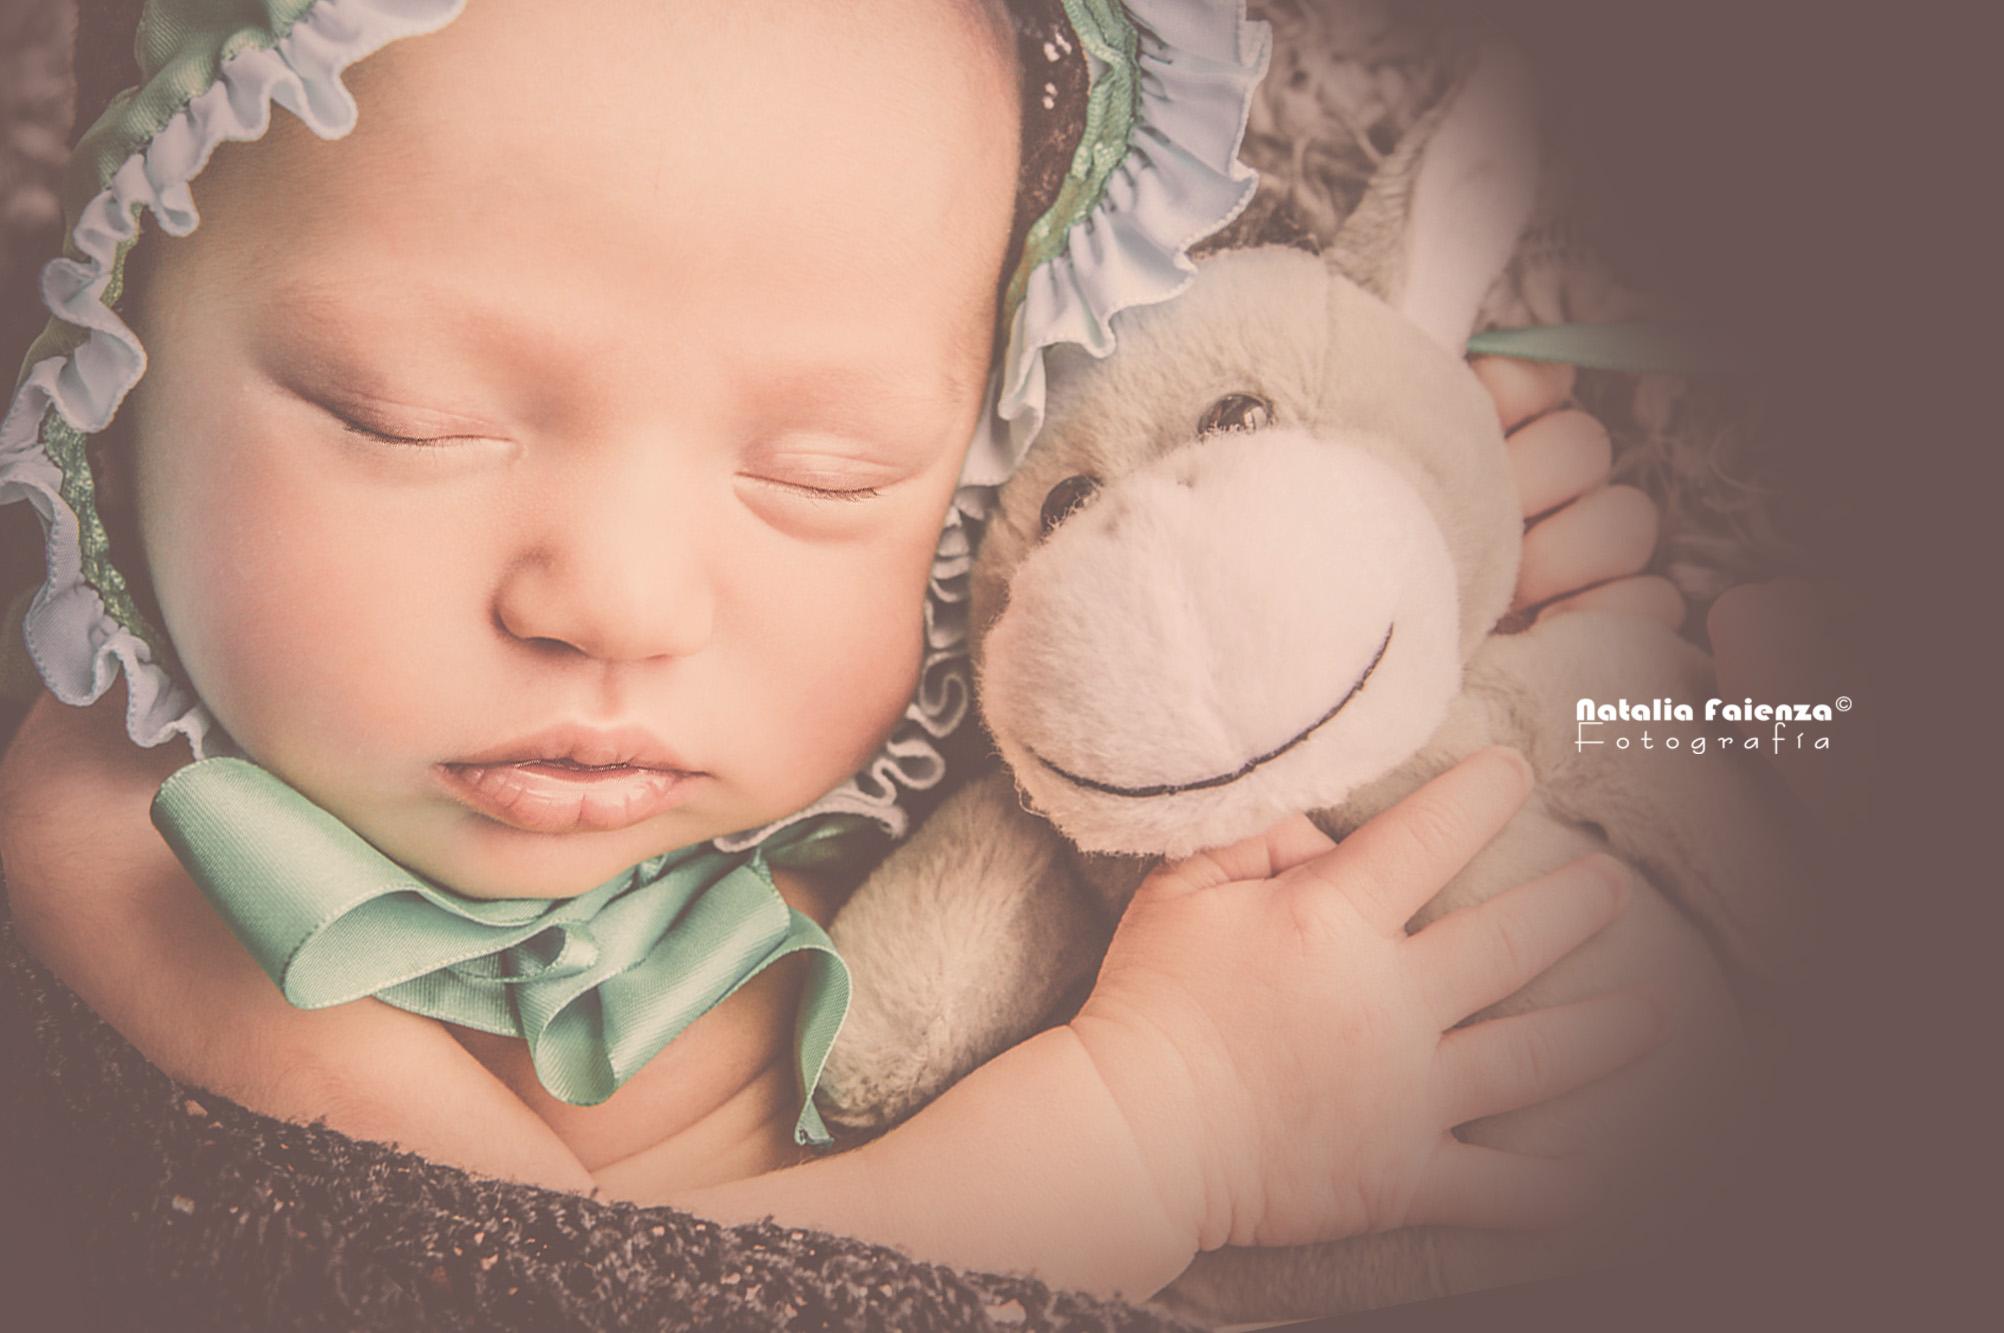 Natalia Faienza Fotografia bebes (7)